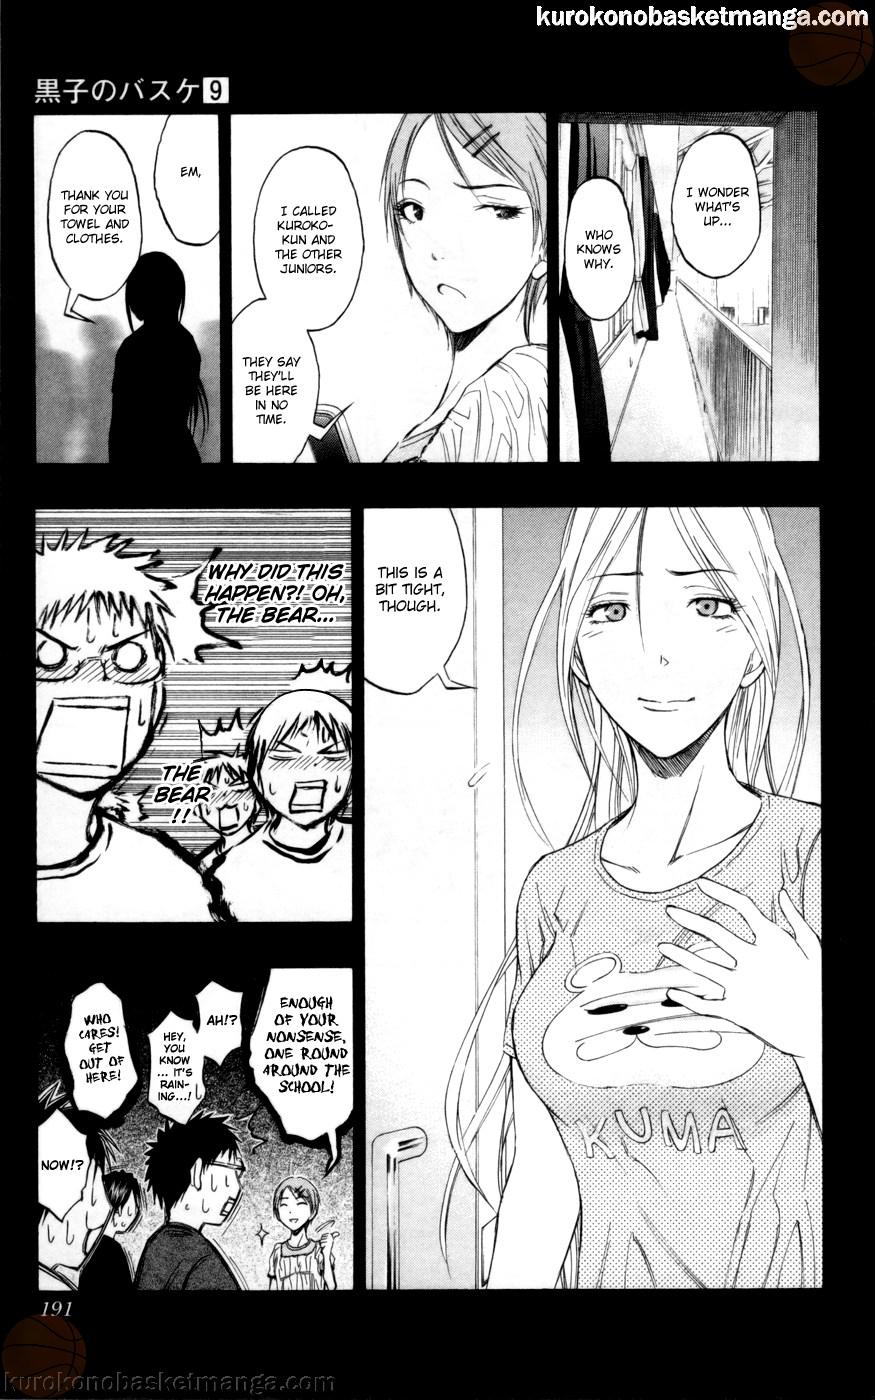 Kuroko no Basket Manga Chapter 80 - Image 05